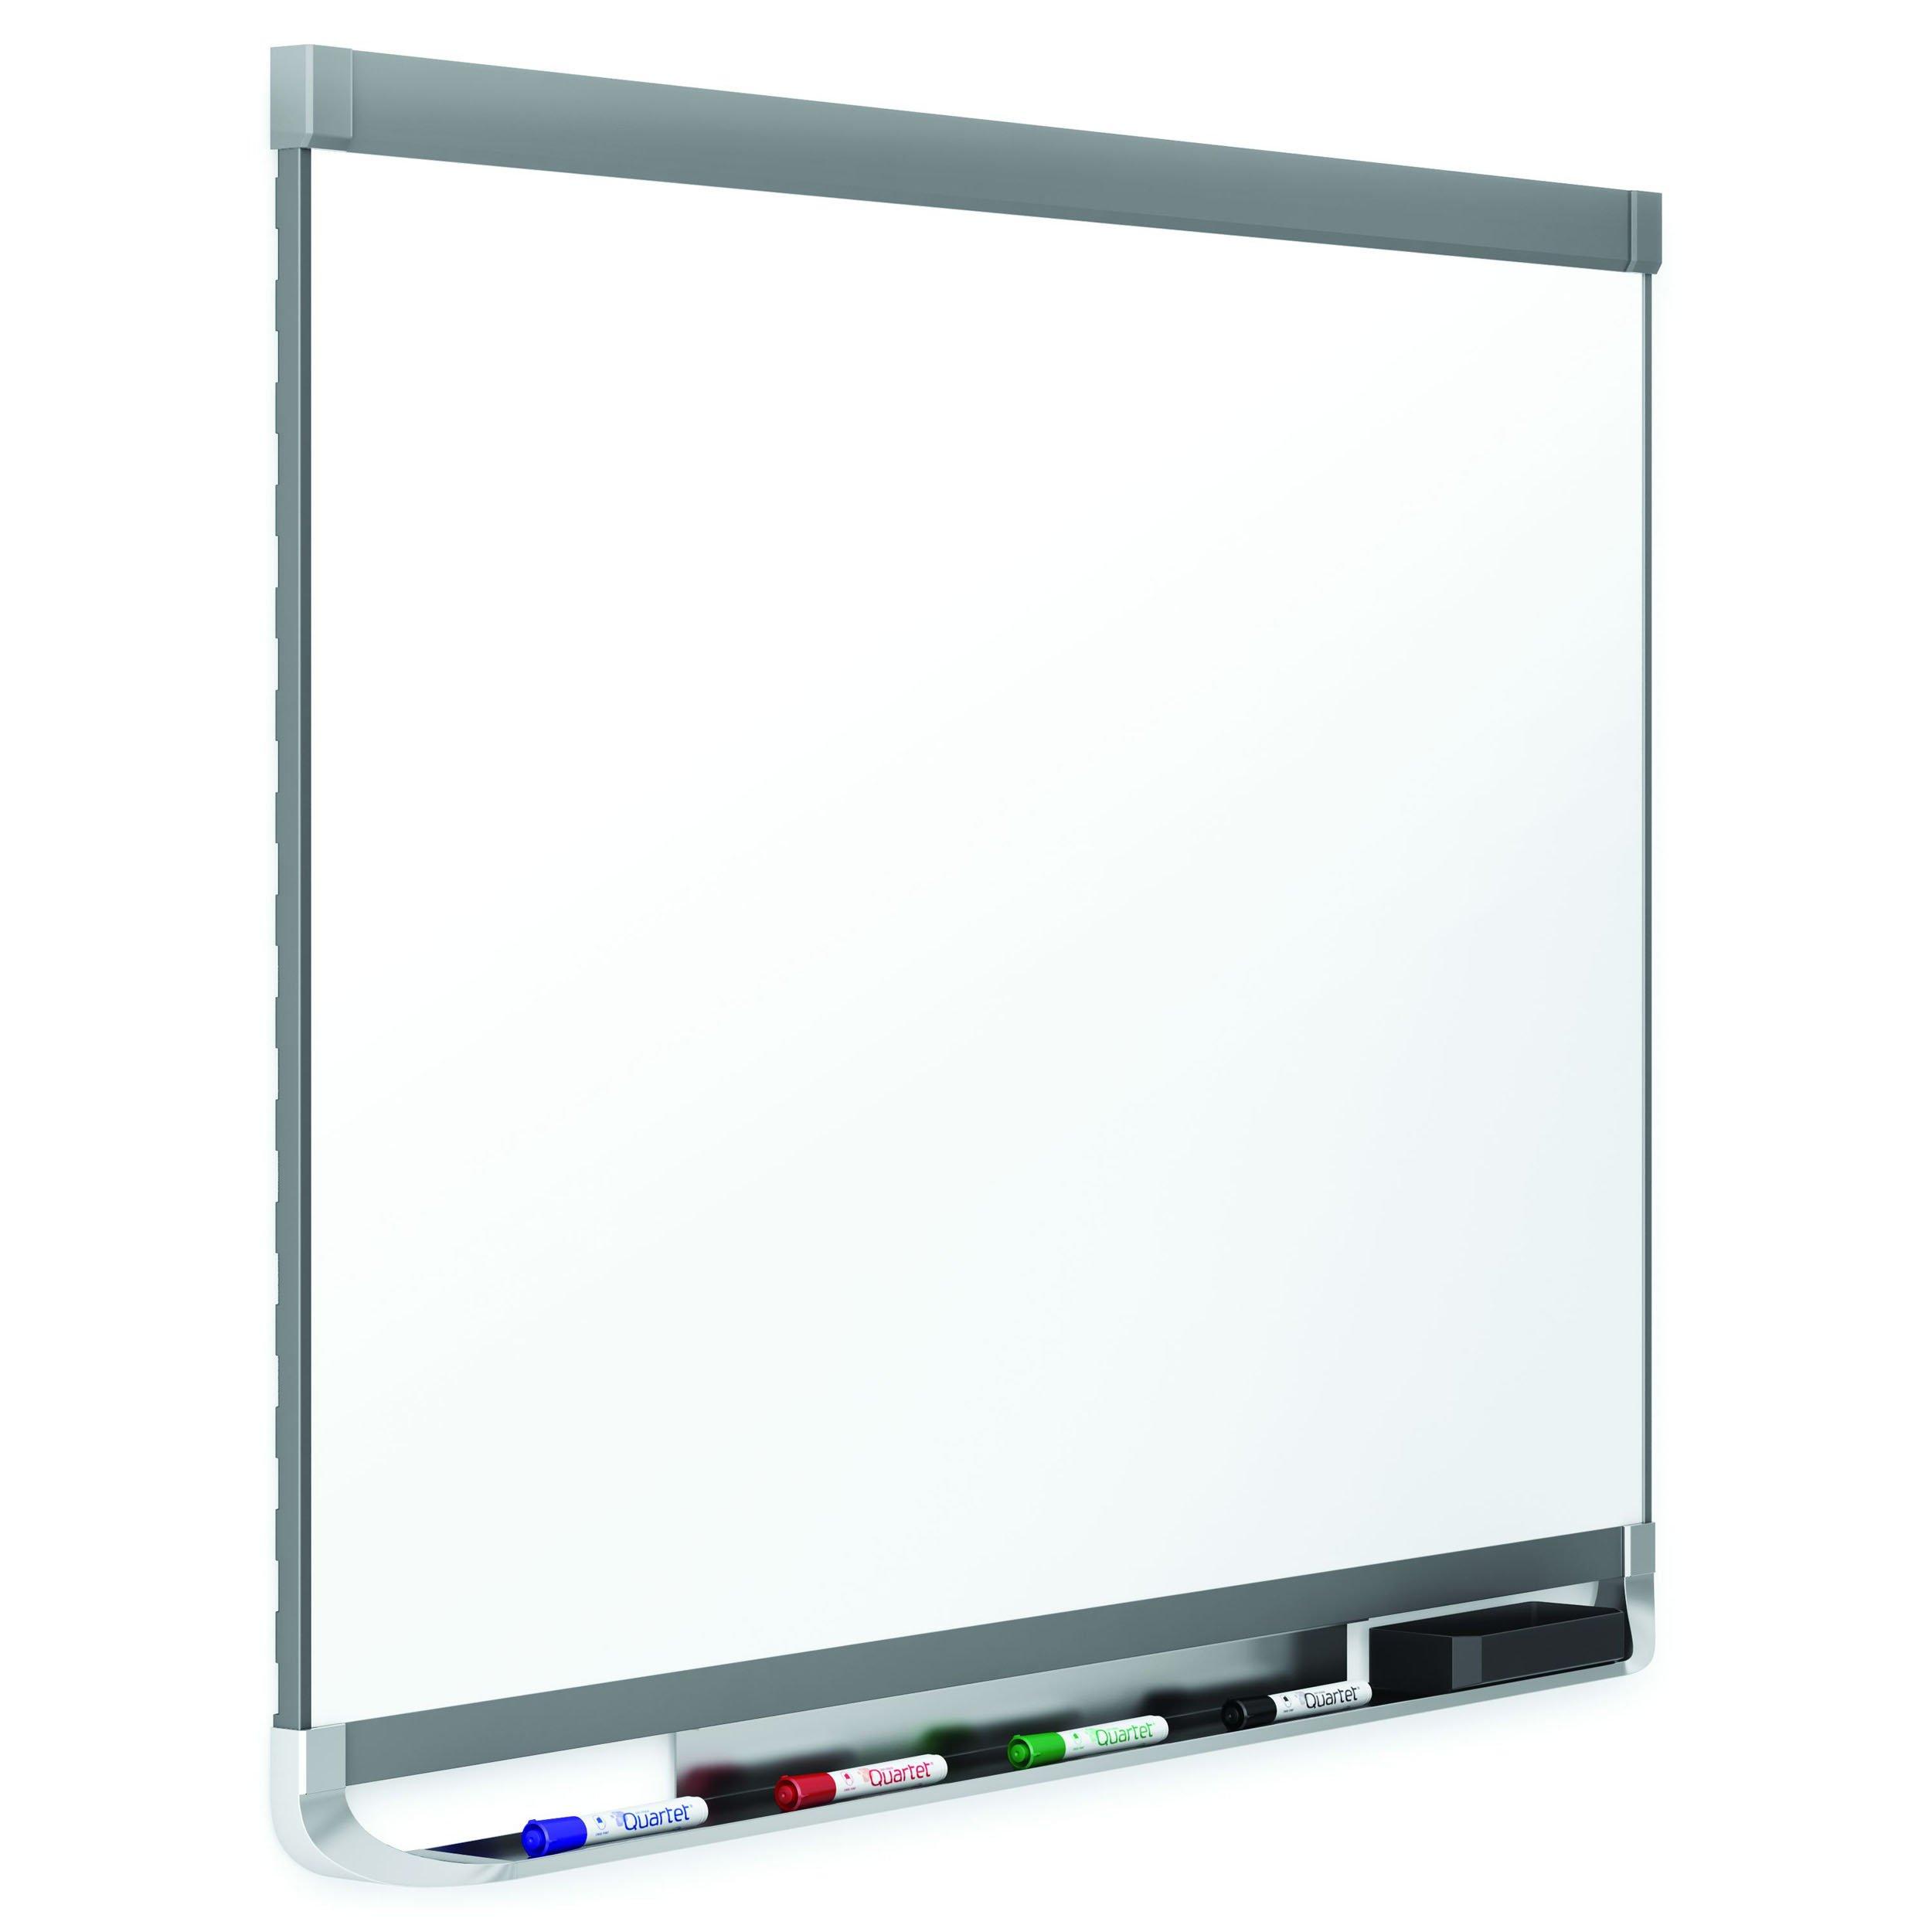 Quartet Prestige 2 DuraMax Porcelain Magnetic Whiteboard, 6 x 4 Feet, Graphite Finish Frame (P557GP2)